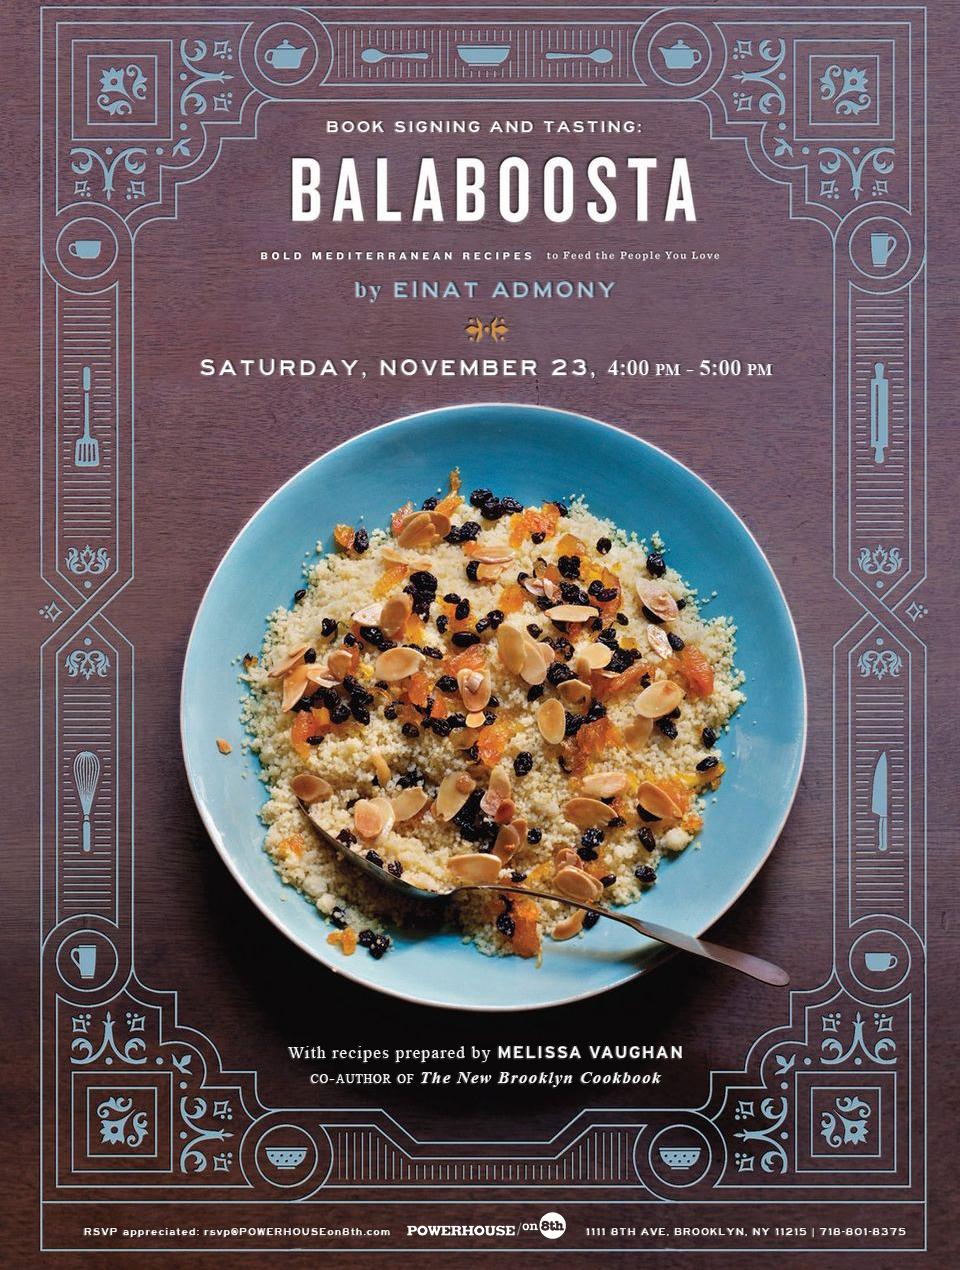 Cookbook Tasting Series with Melissa Vaughan: BALABOOSTA by Einat Admony